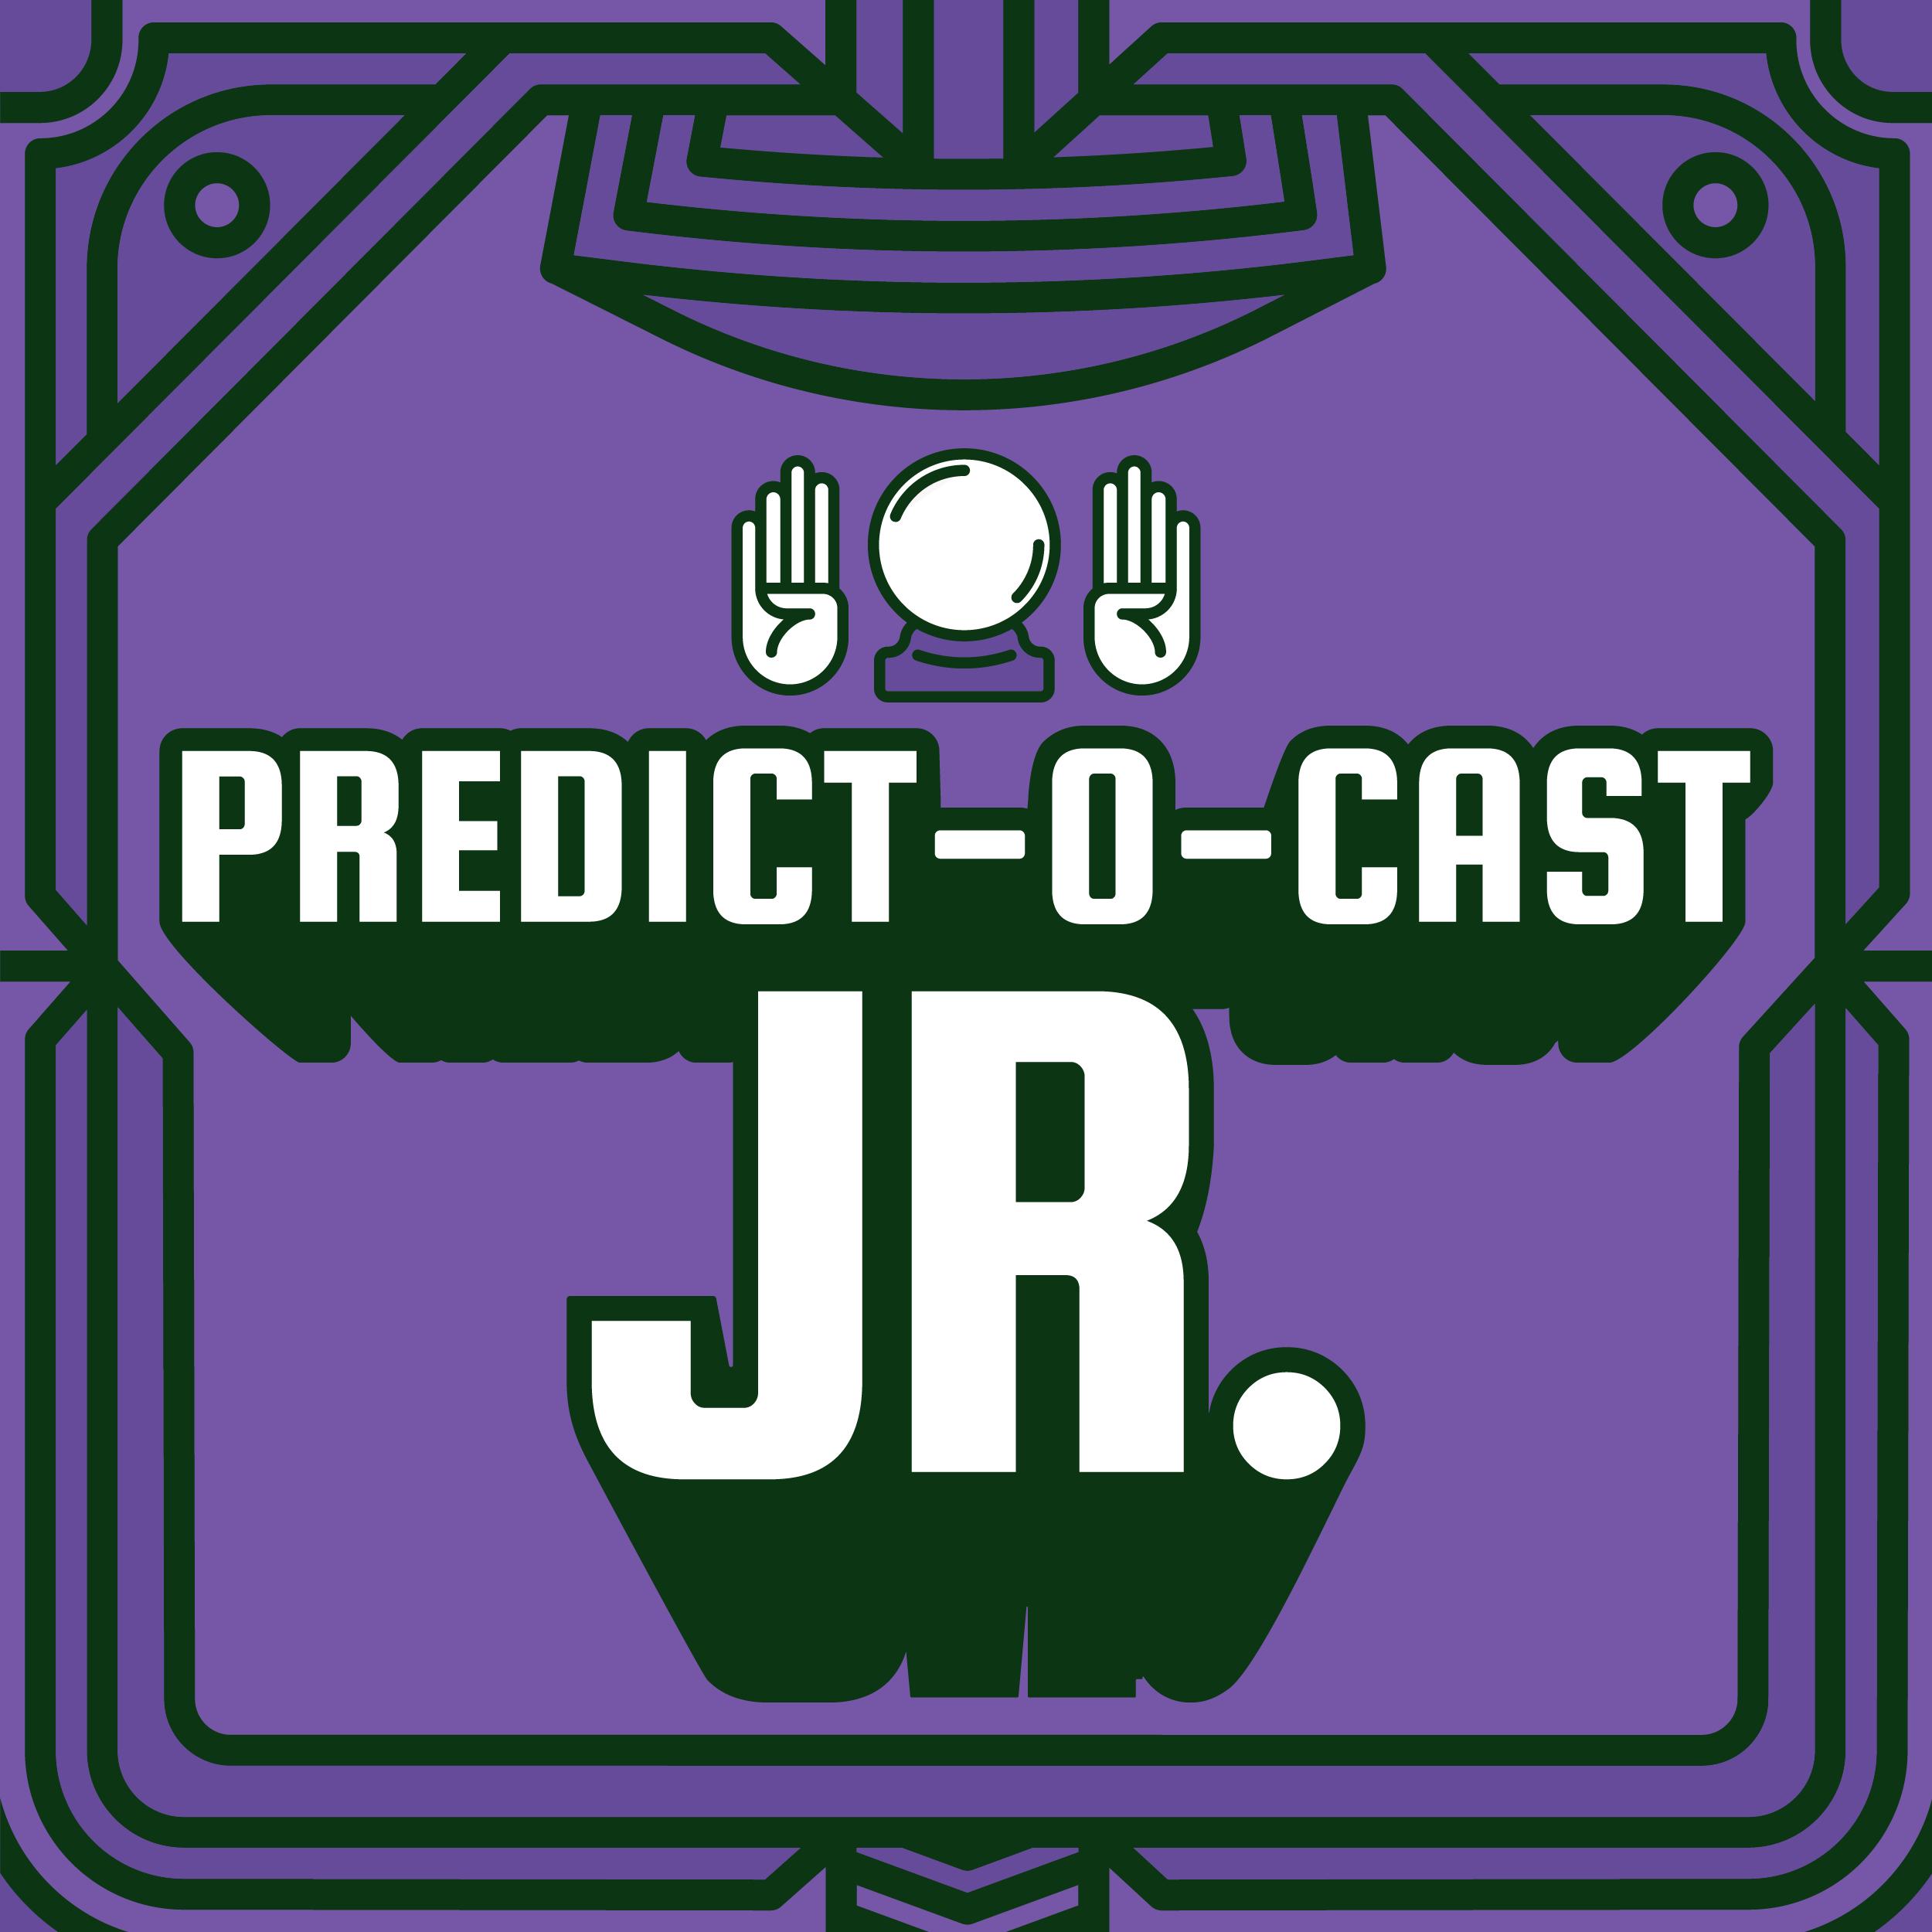 Artwork for Predict-O-Cast, Jr. Ep. 7: Monkey Up (2016)